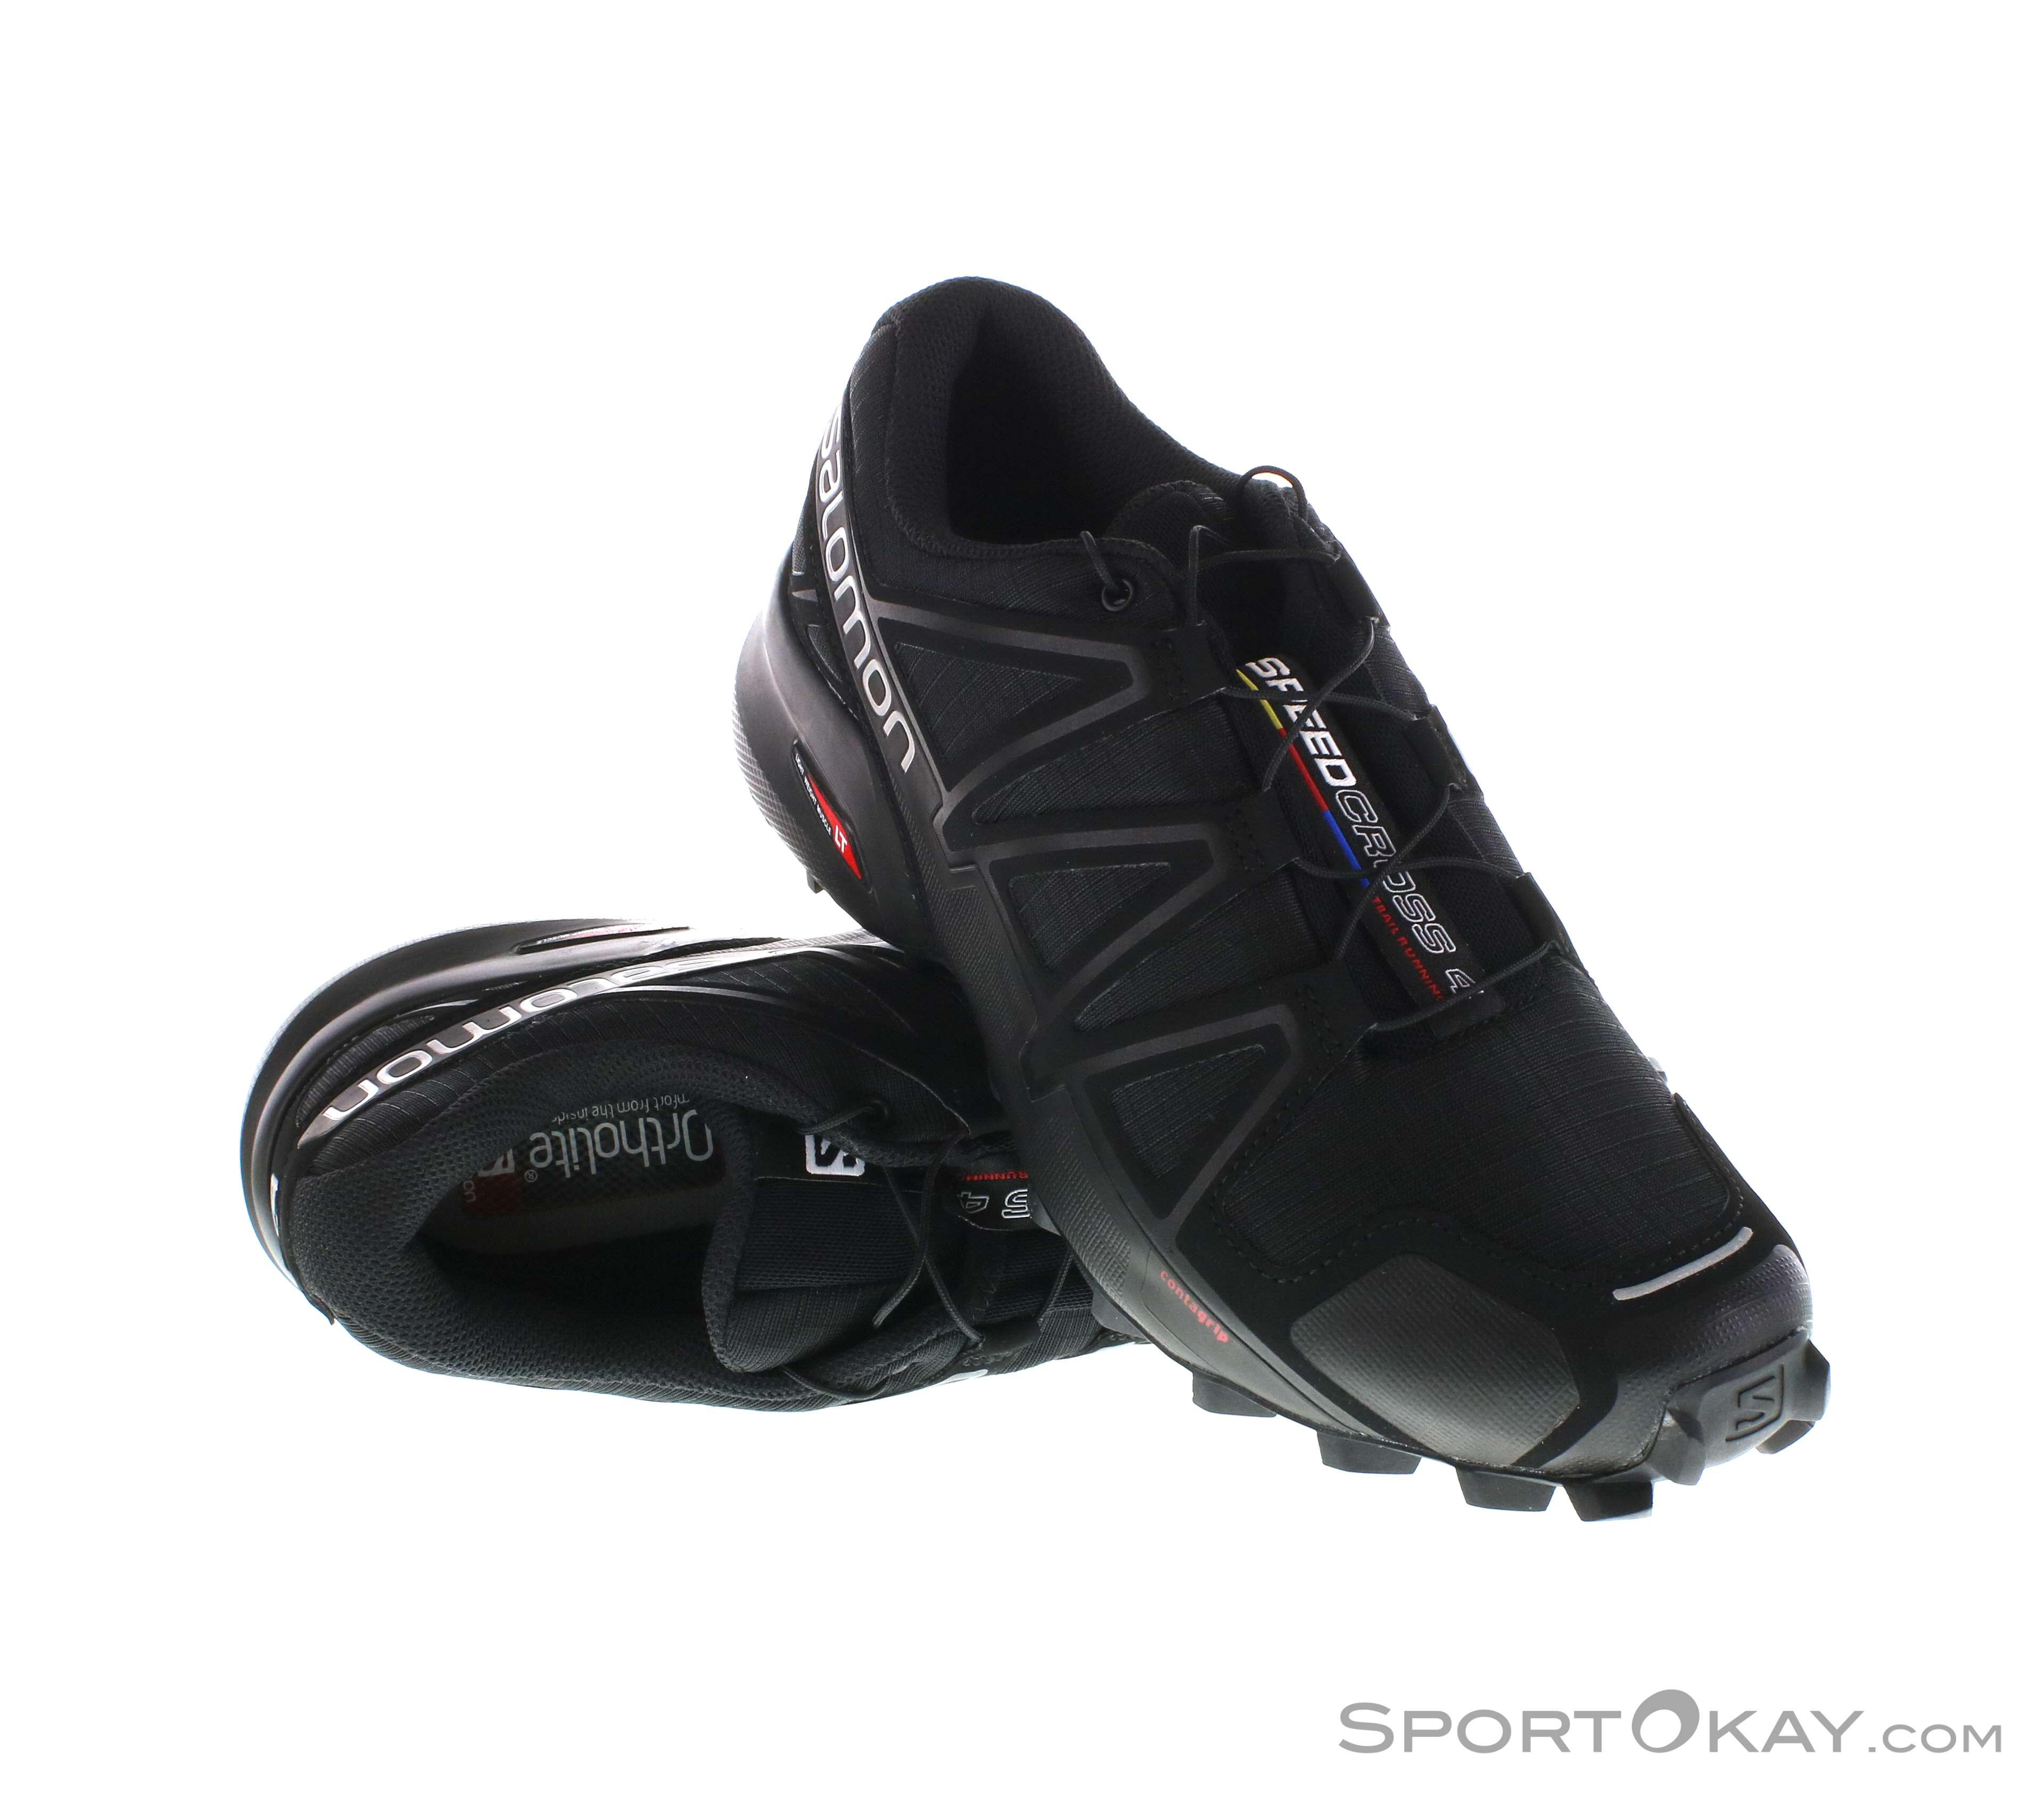 Salomon Speedcross 4 Damen Traillaufschuhe-Schwarz-6,5